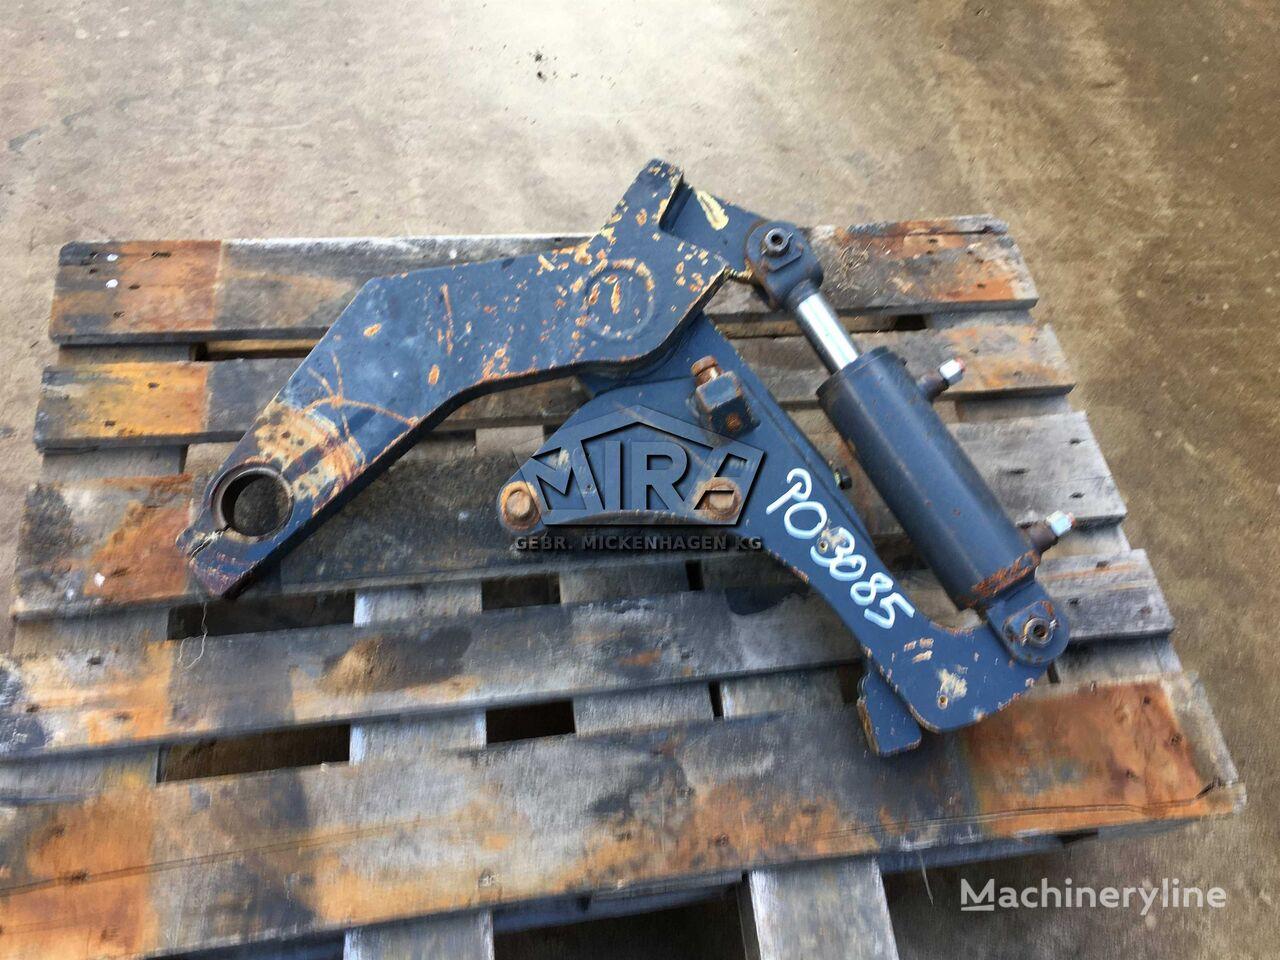 Kantenschneidgerät KSG other operating parts for BOMAG BW 174 construction roller